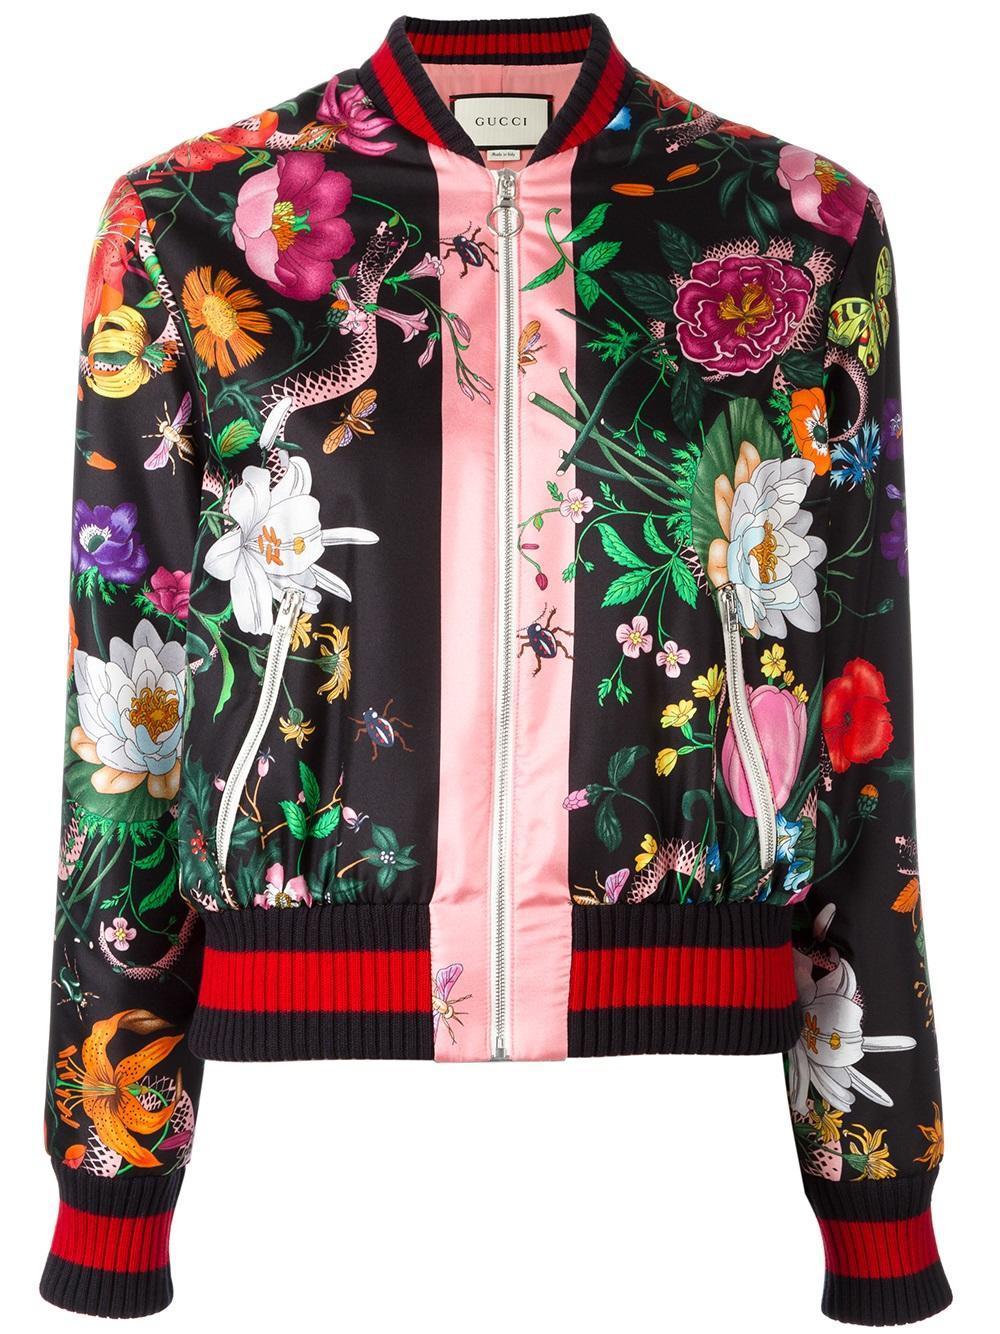 Gucci Floral Print Bomber Jacket Lyst